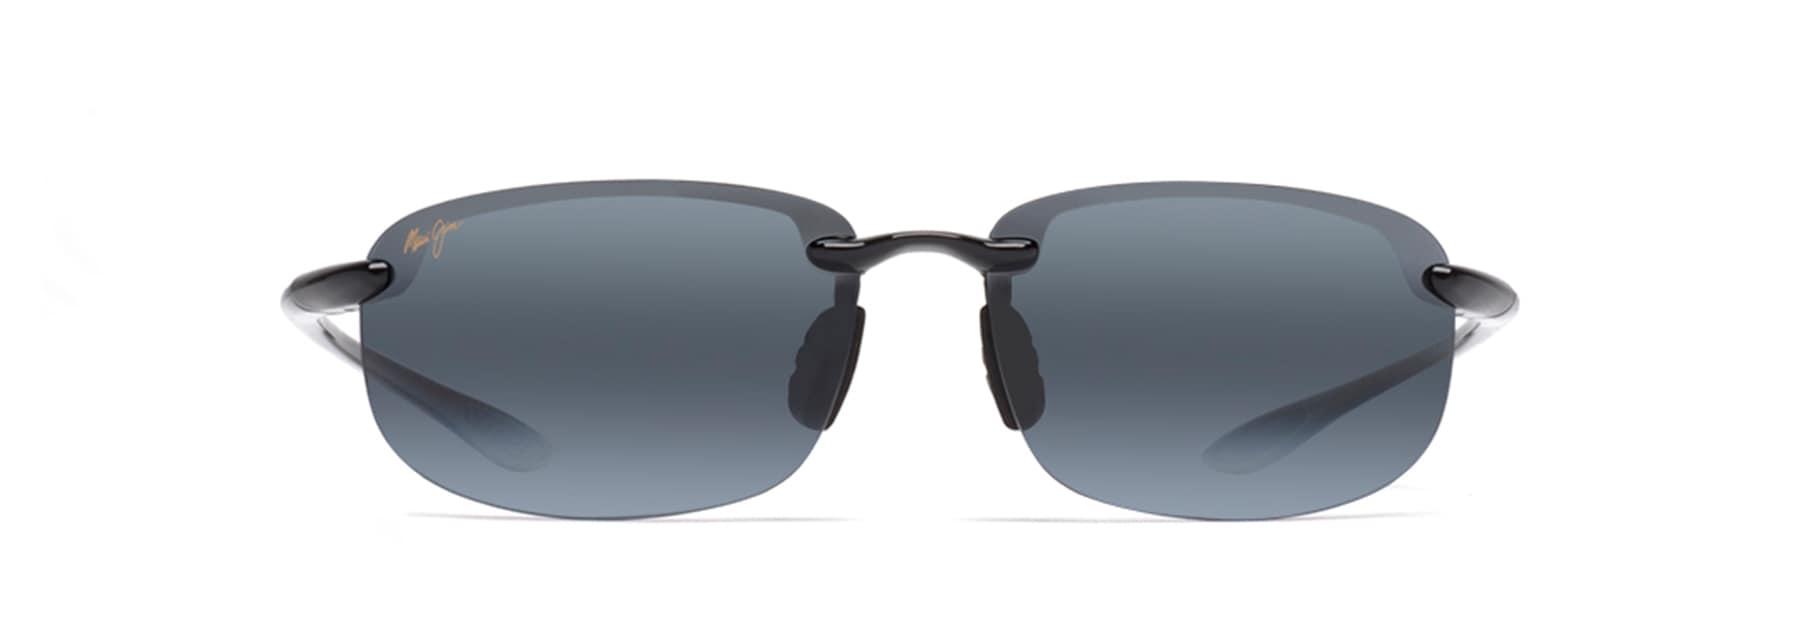 91d58aae9 Ho'okipa Polarized Sunglasses | Maui Jim®